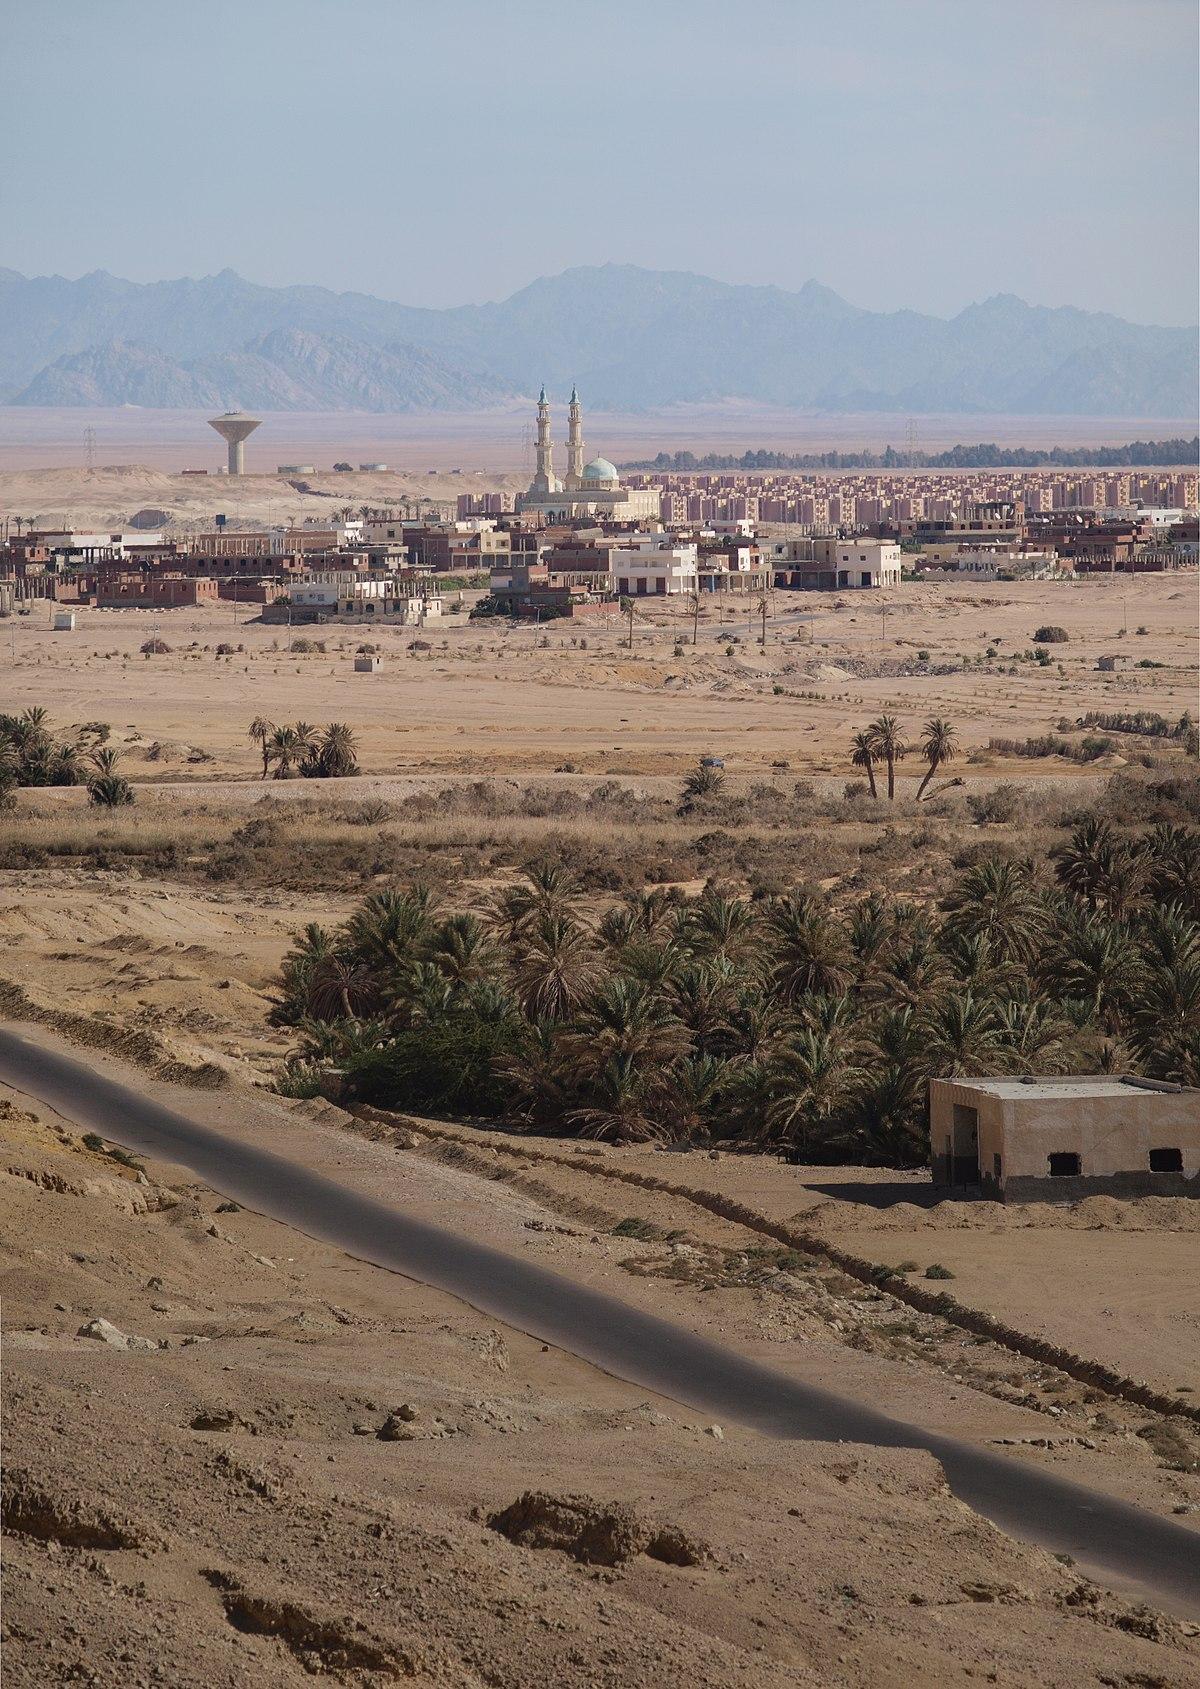 El Tor, Egypt - Wikipedia